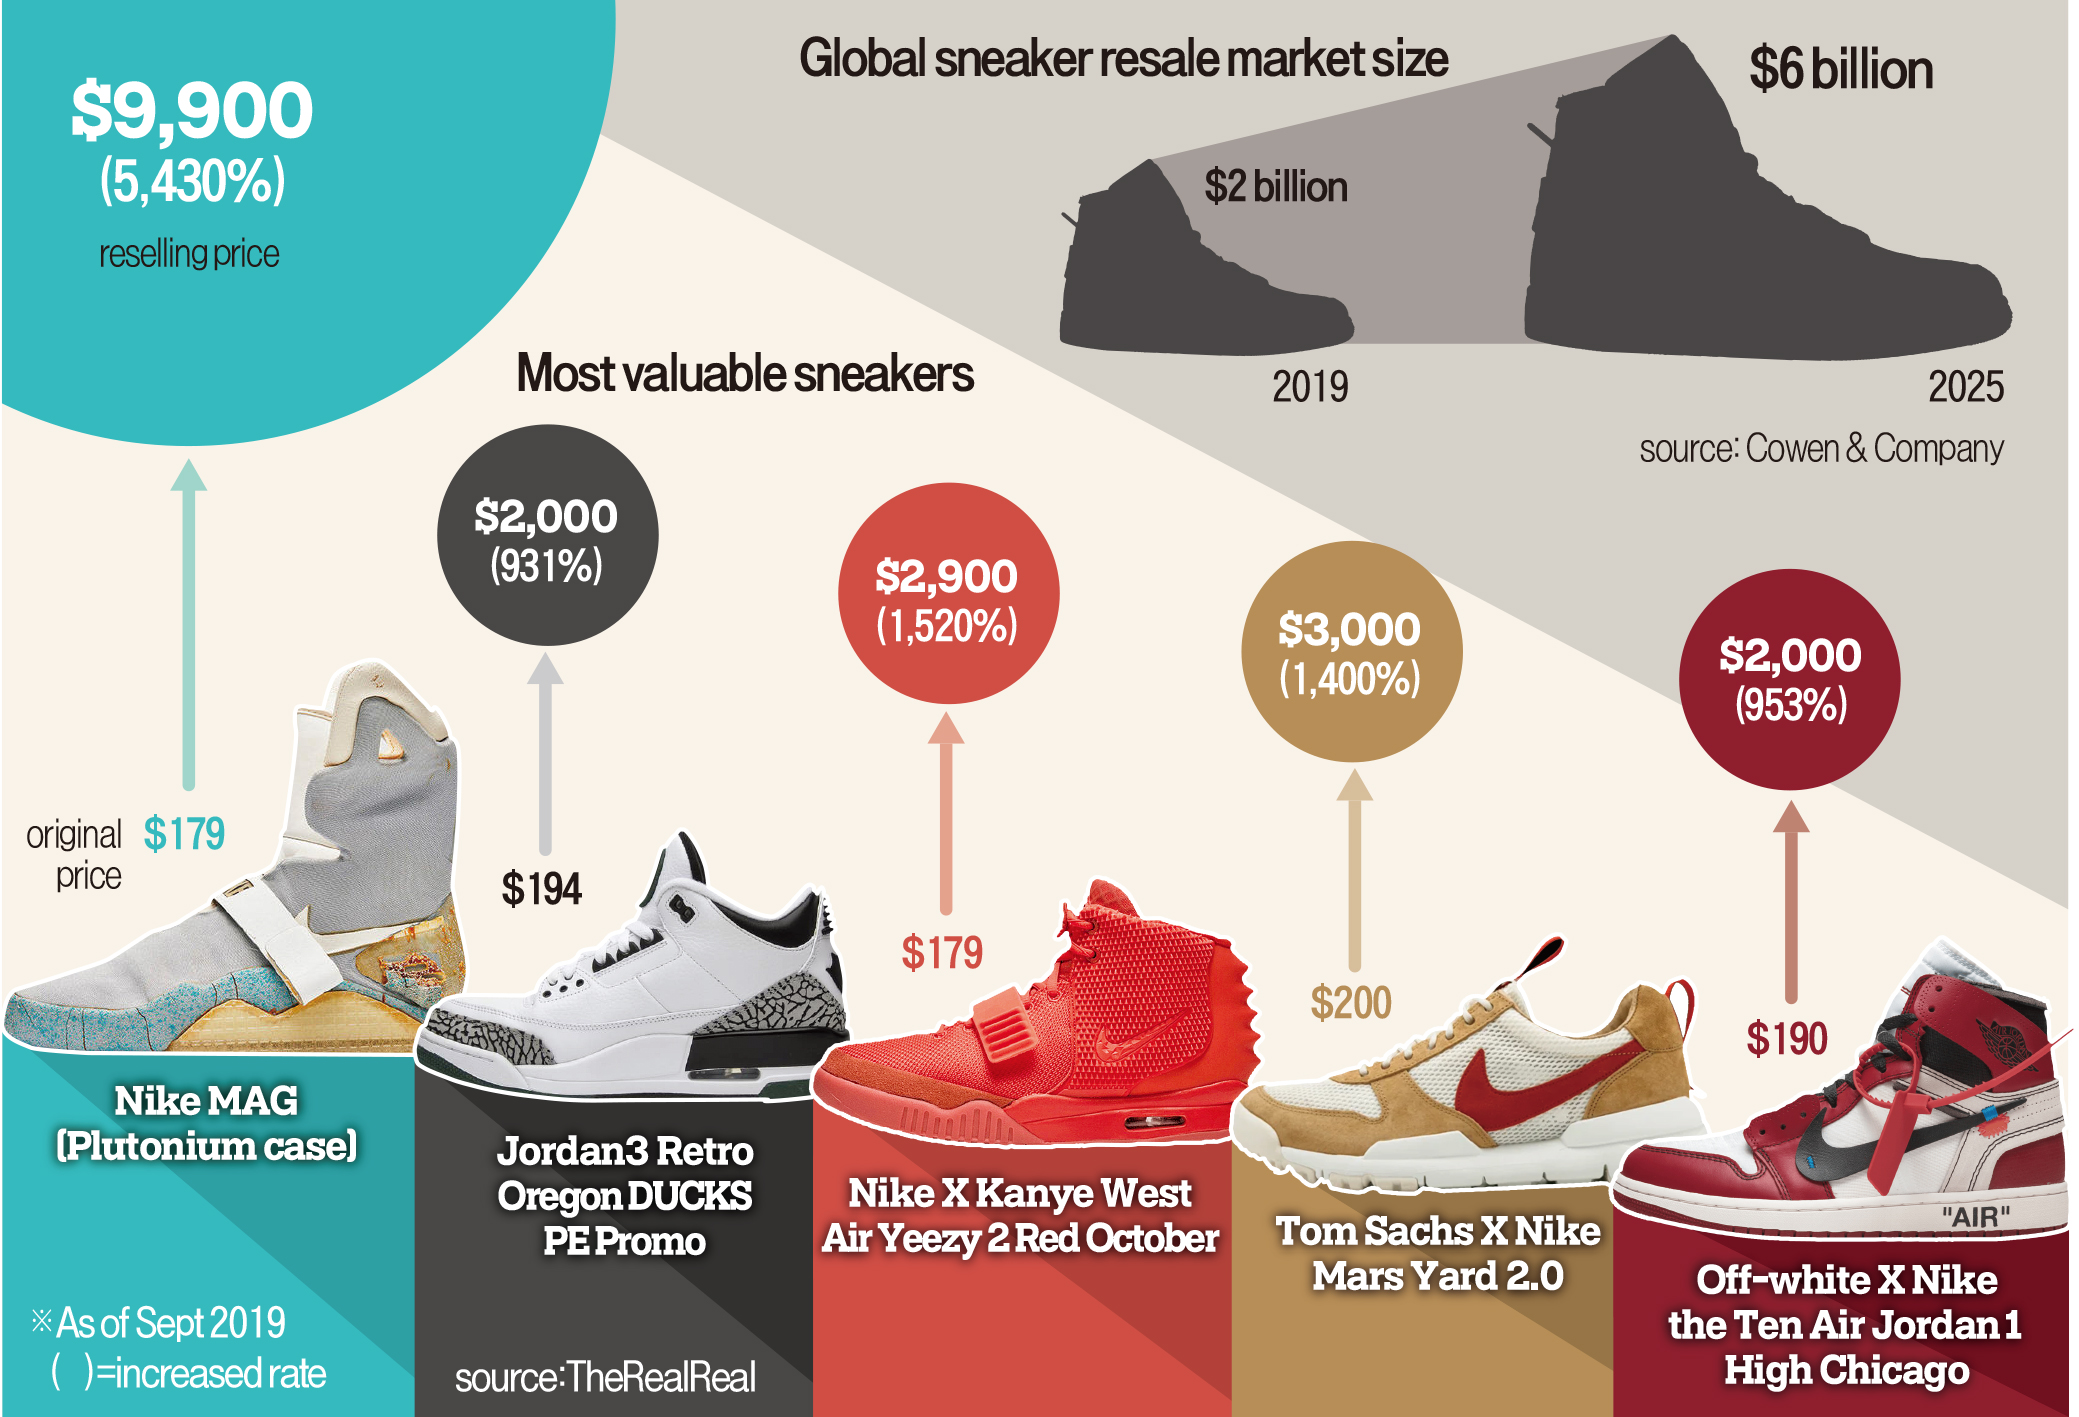 prezzo-sneakers-reselling-smarTalks